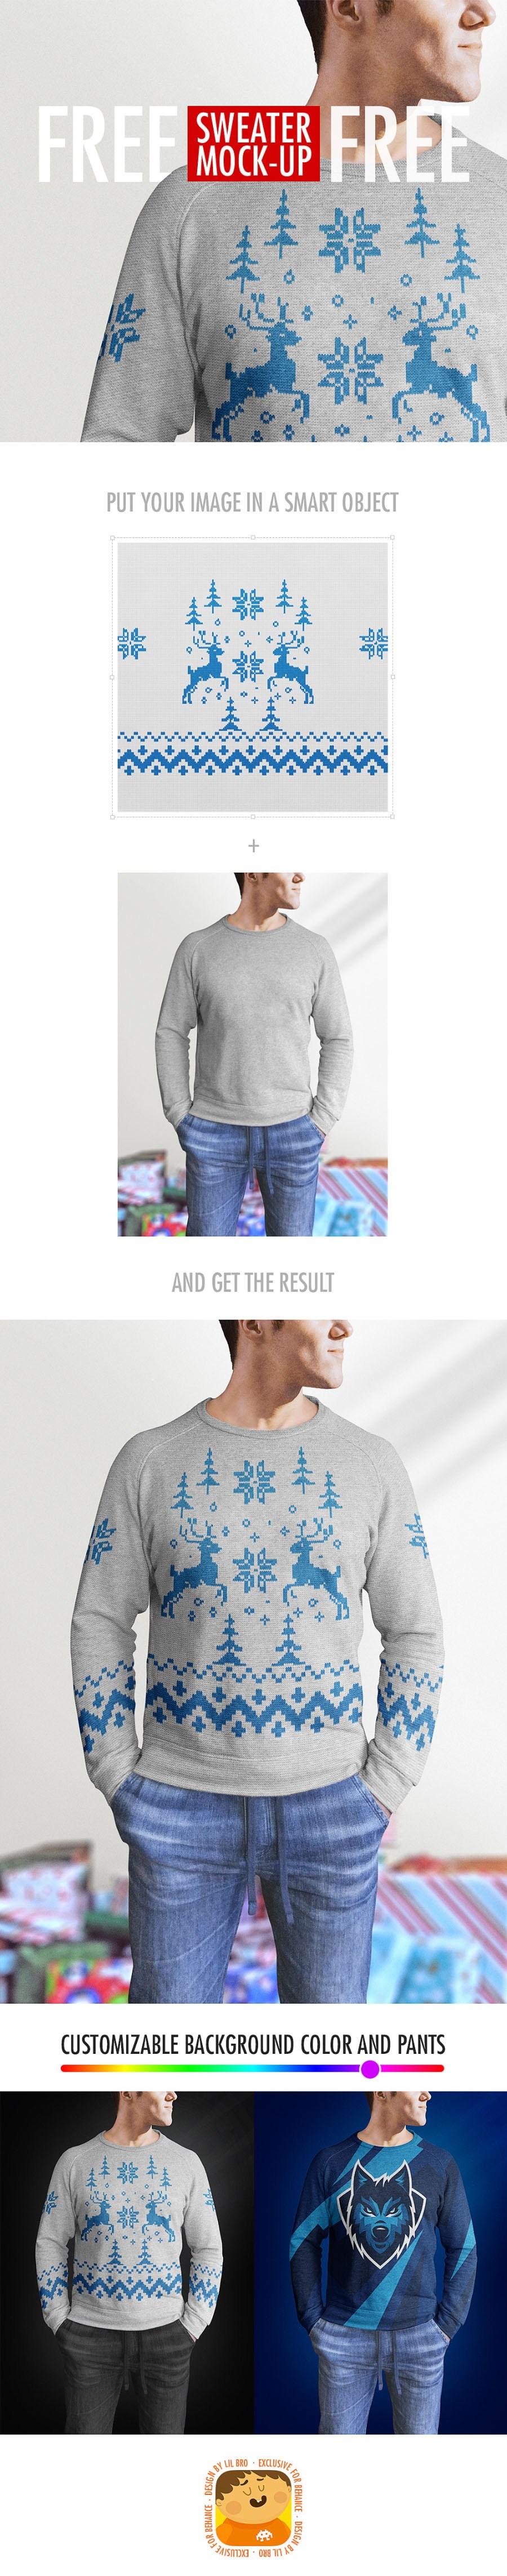 Realistic Men Sweater Design